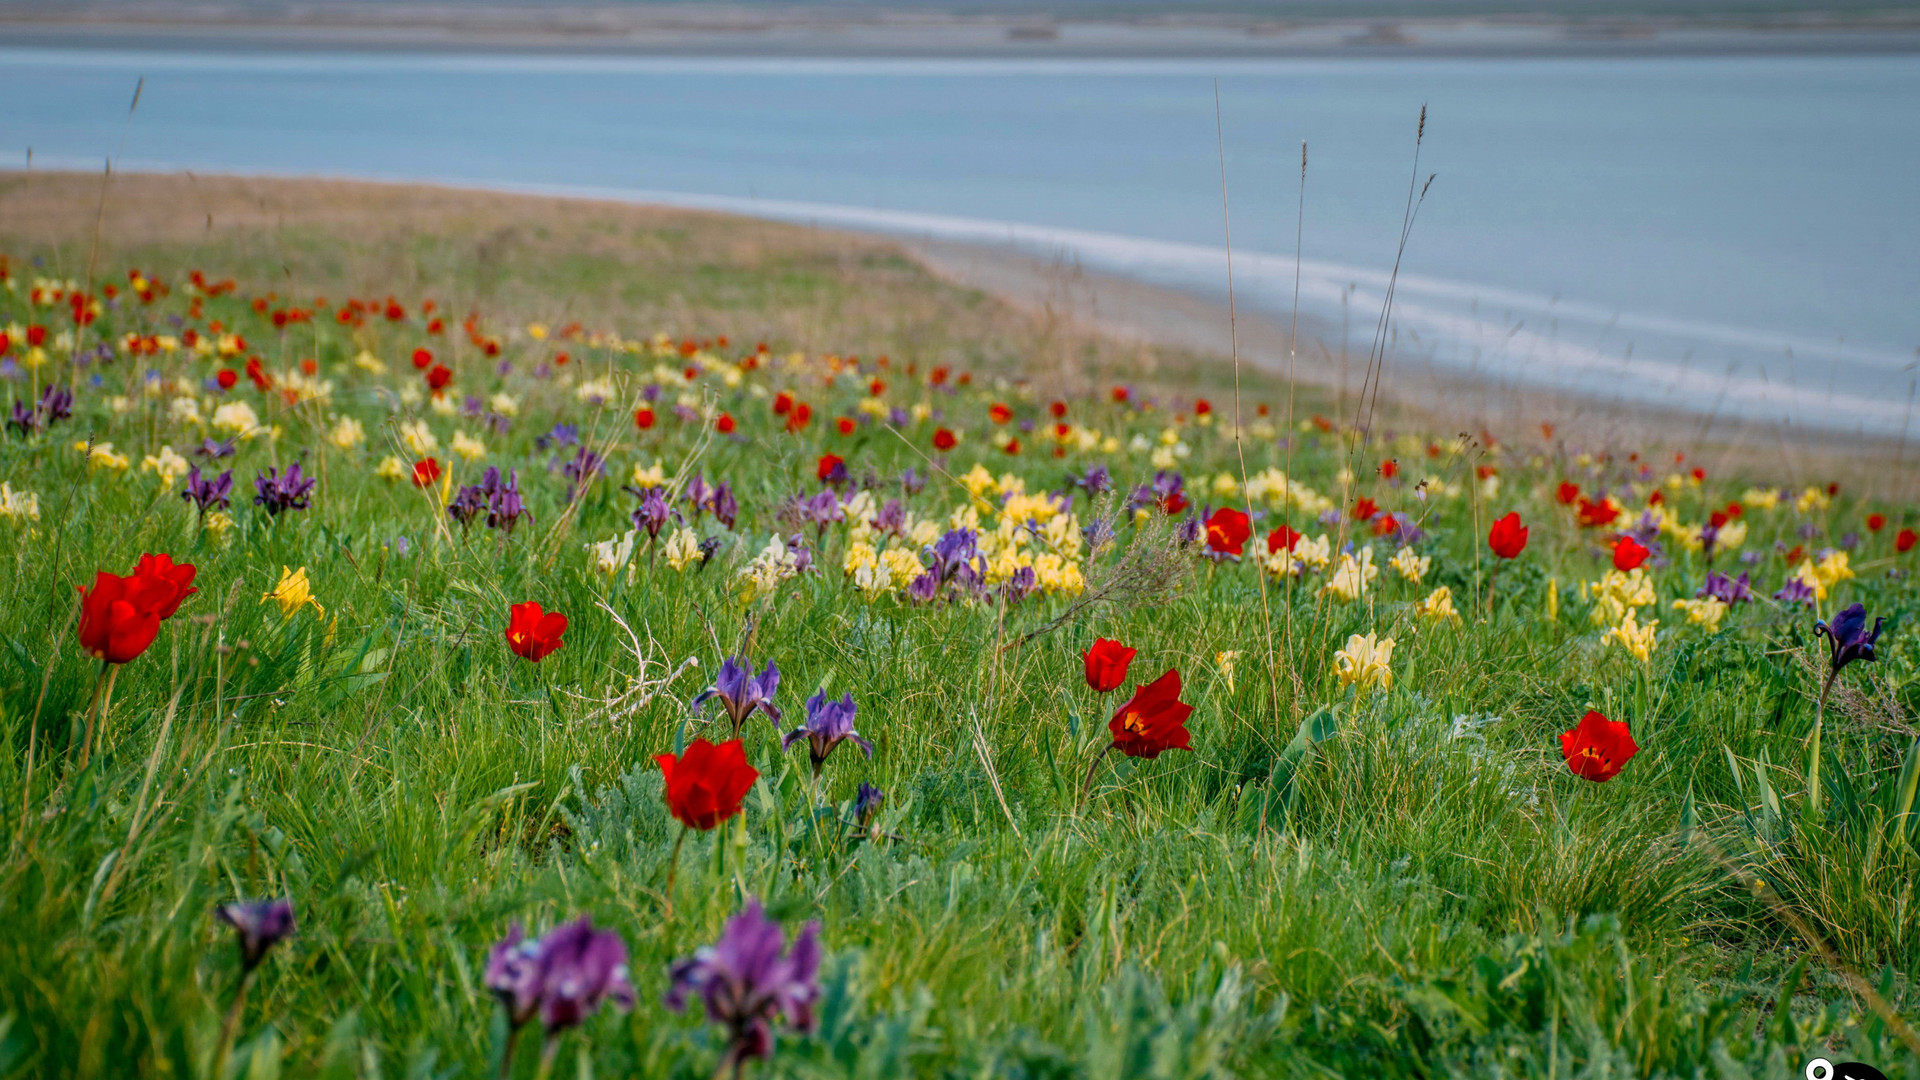 Тюльпаны на озере Маныч-Гудило, Калмыкия